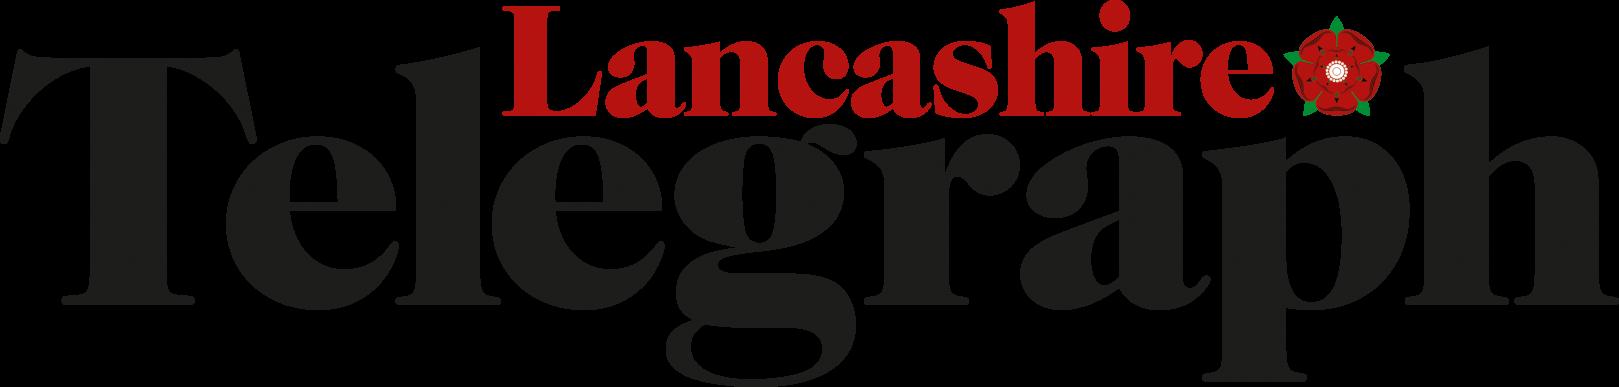 Lancashire Telegraph Logo